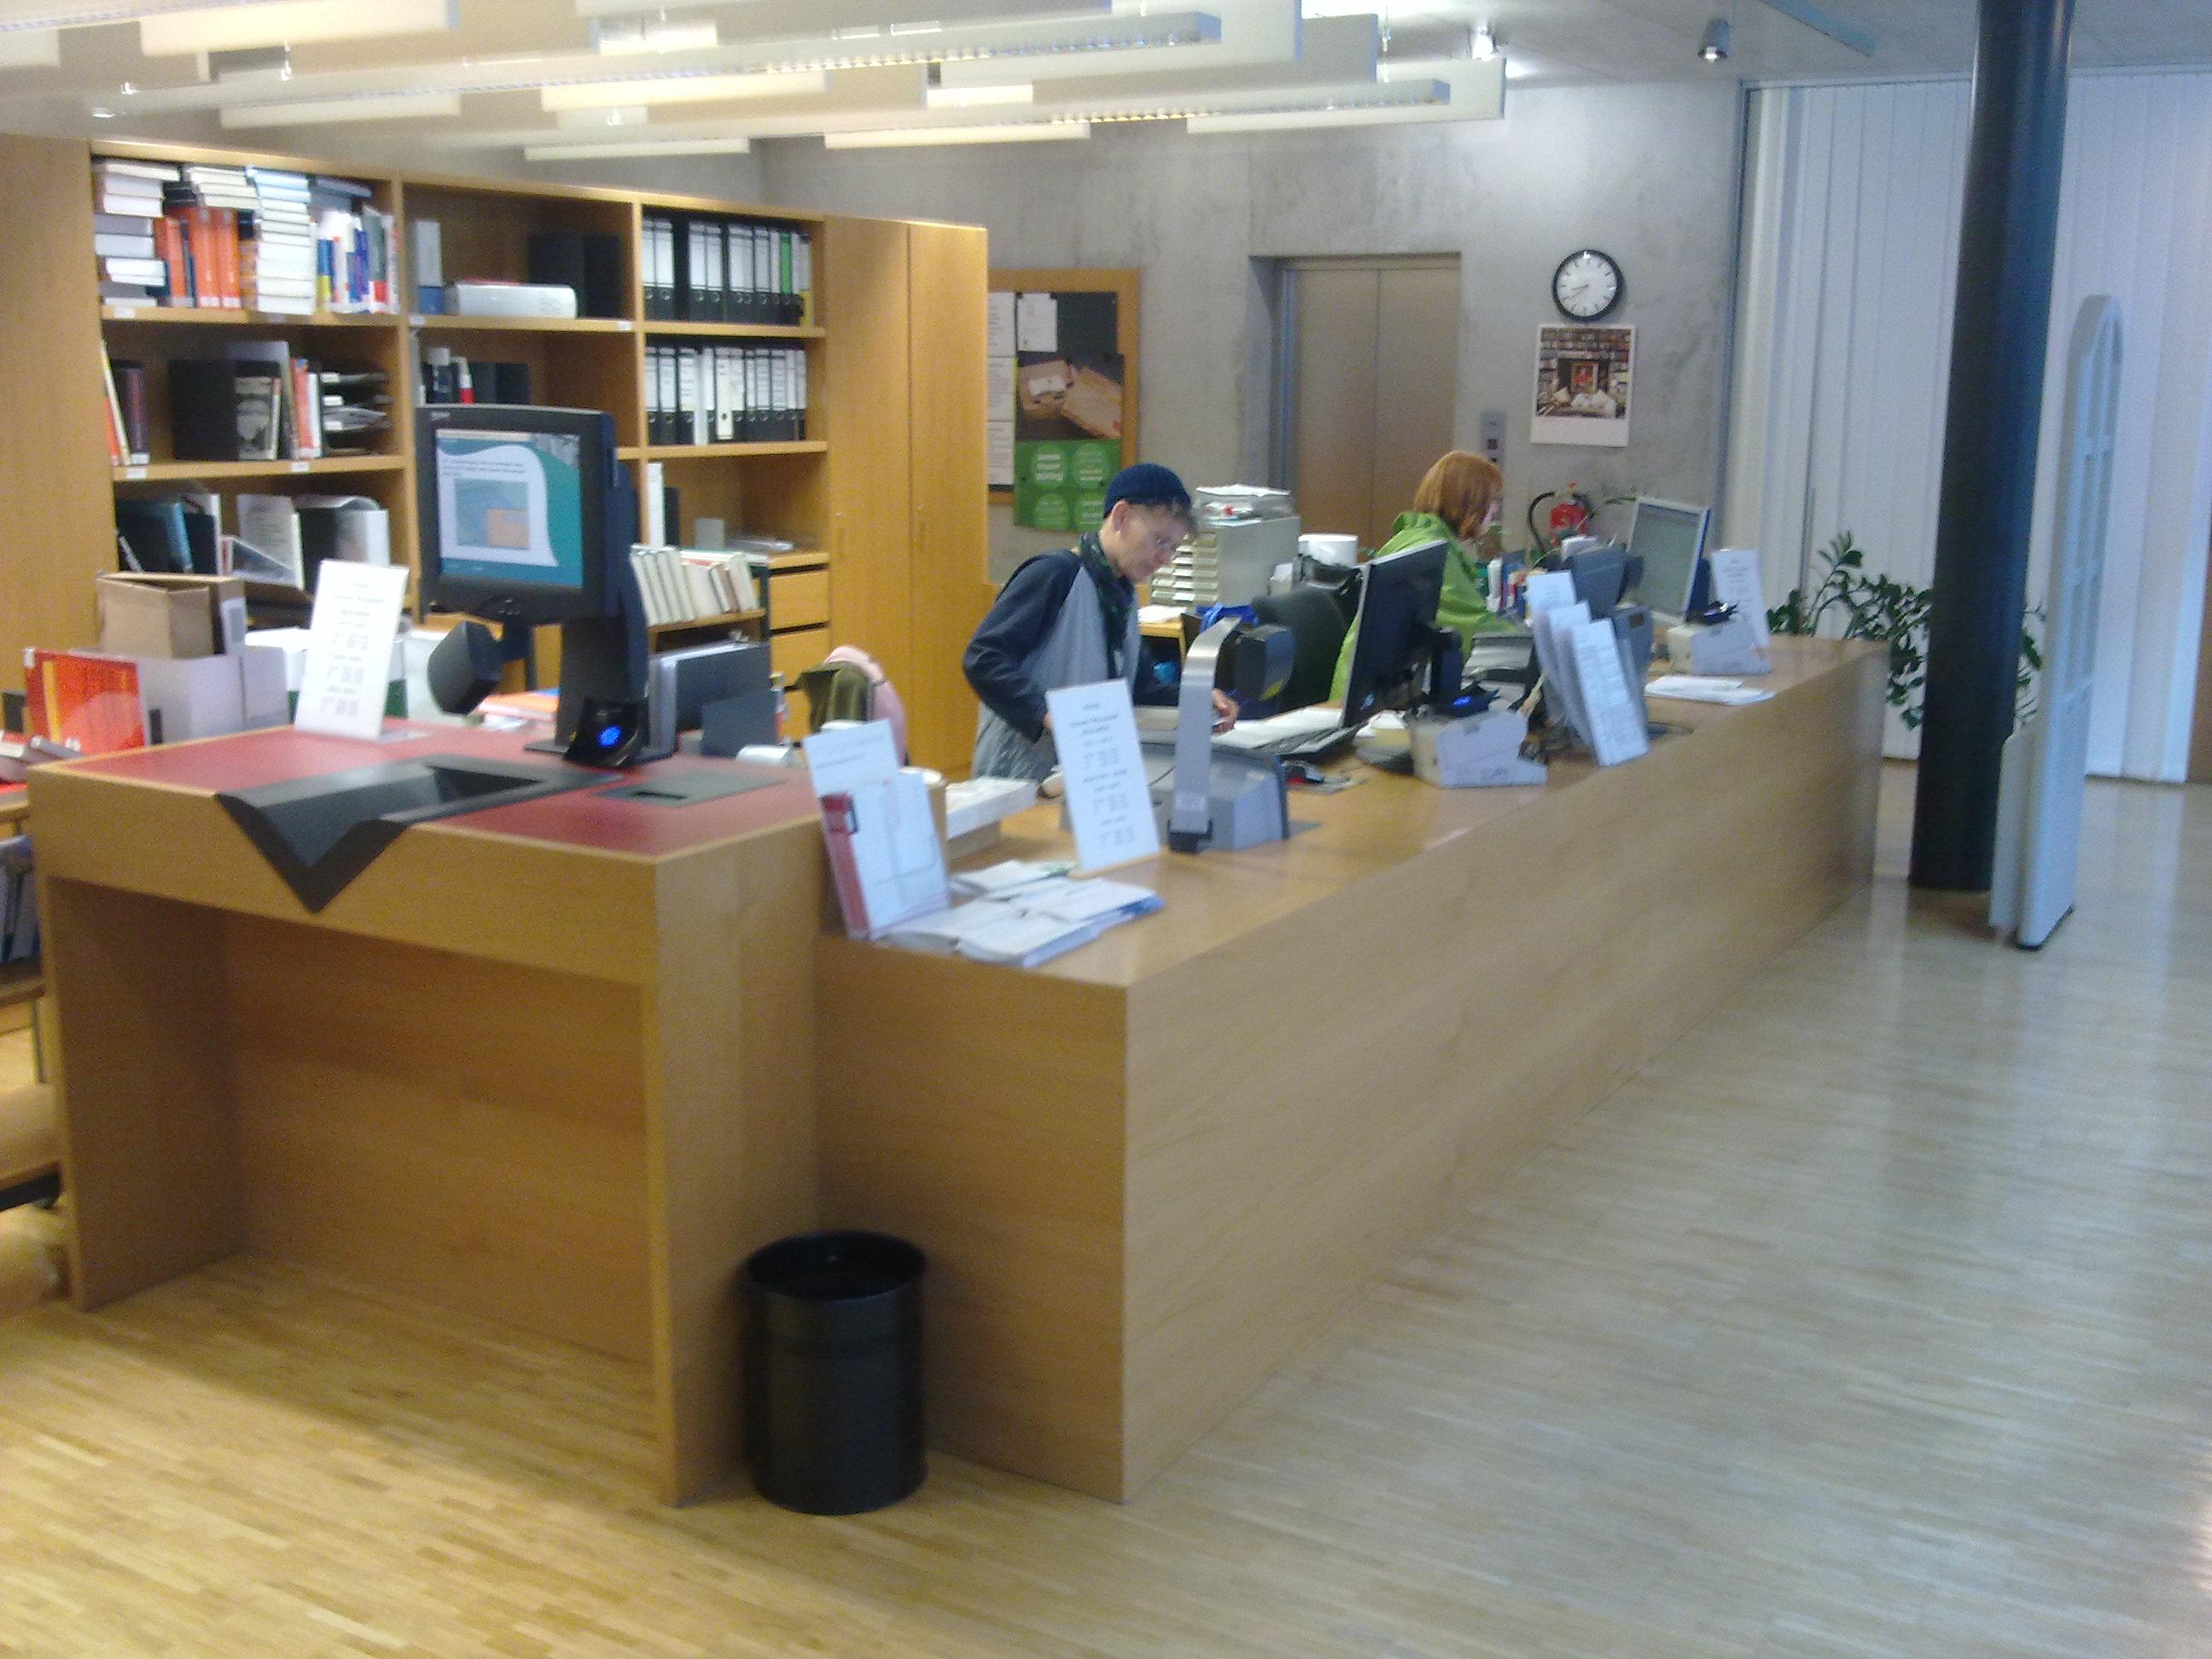 bibliothek mh stuttgart